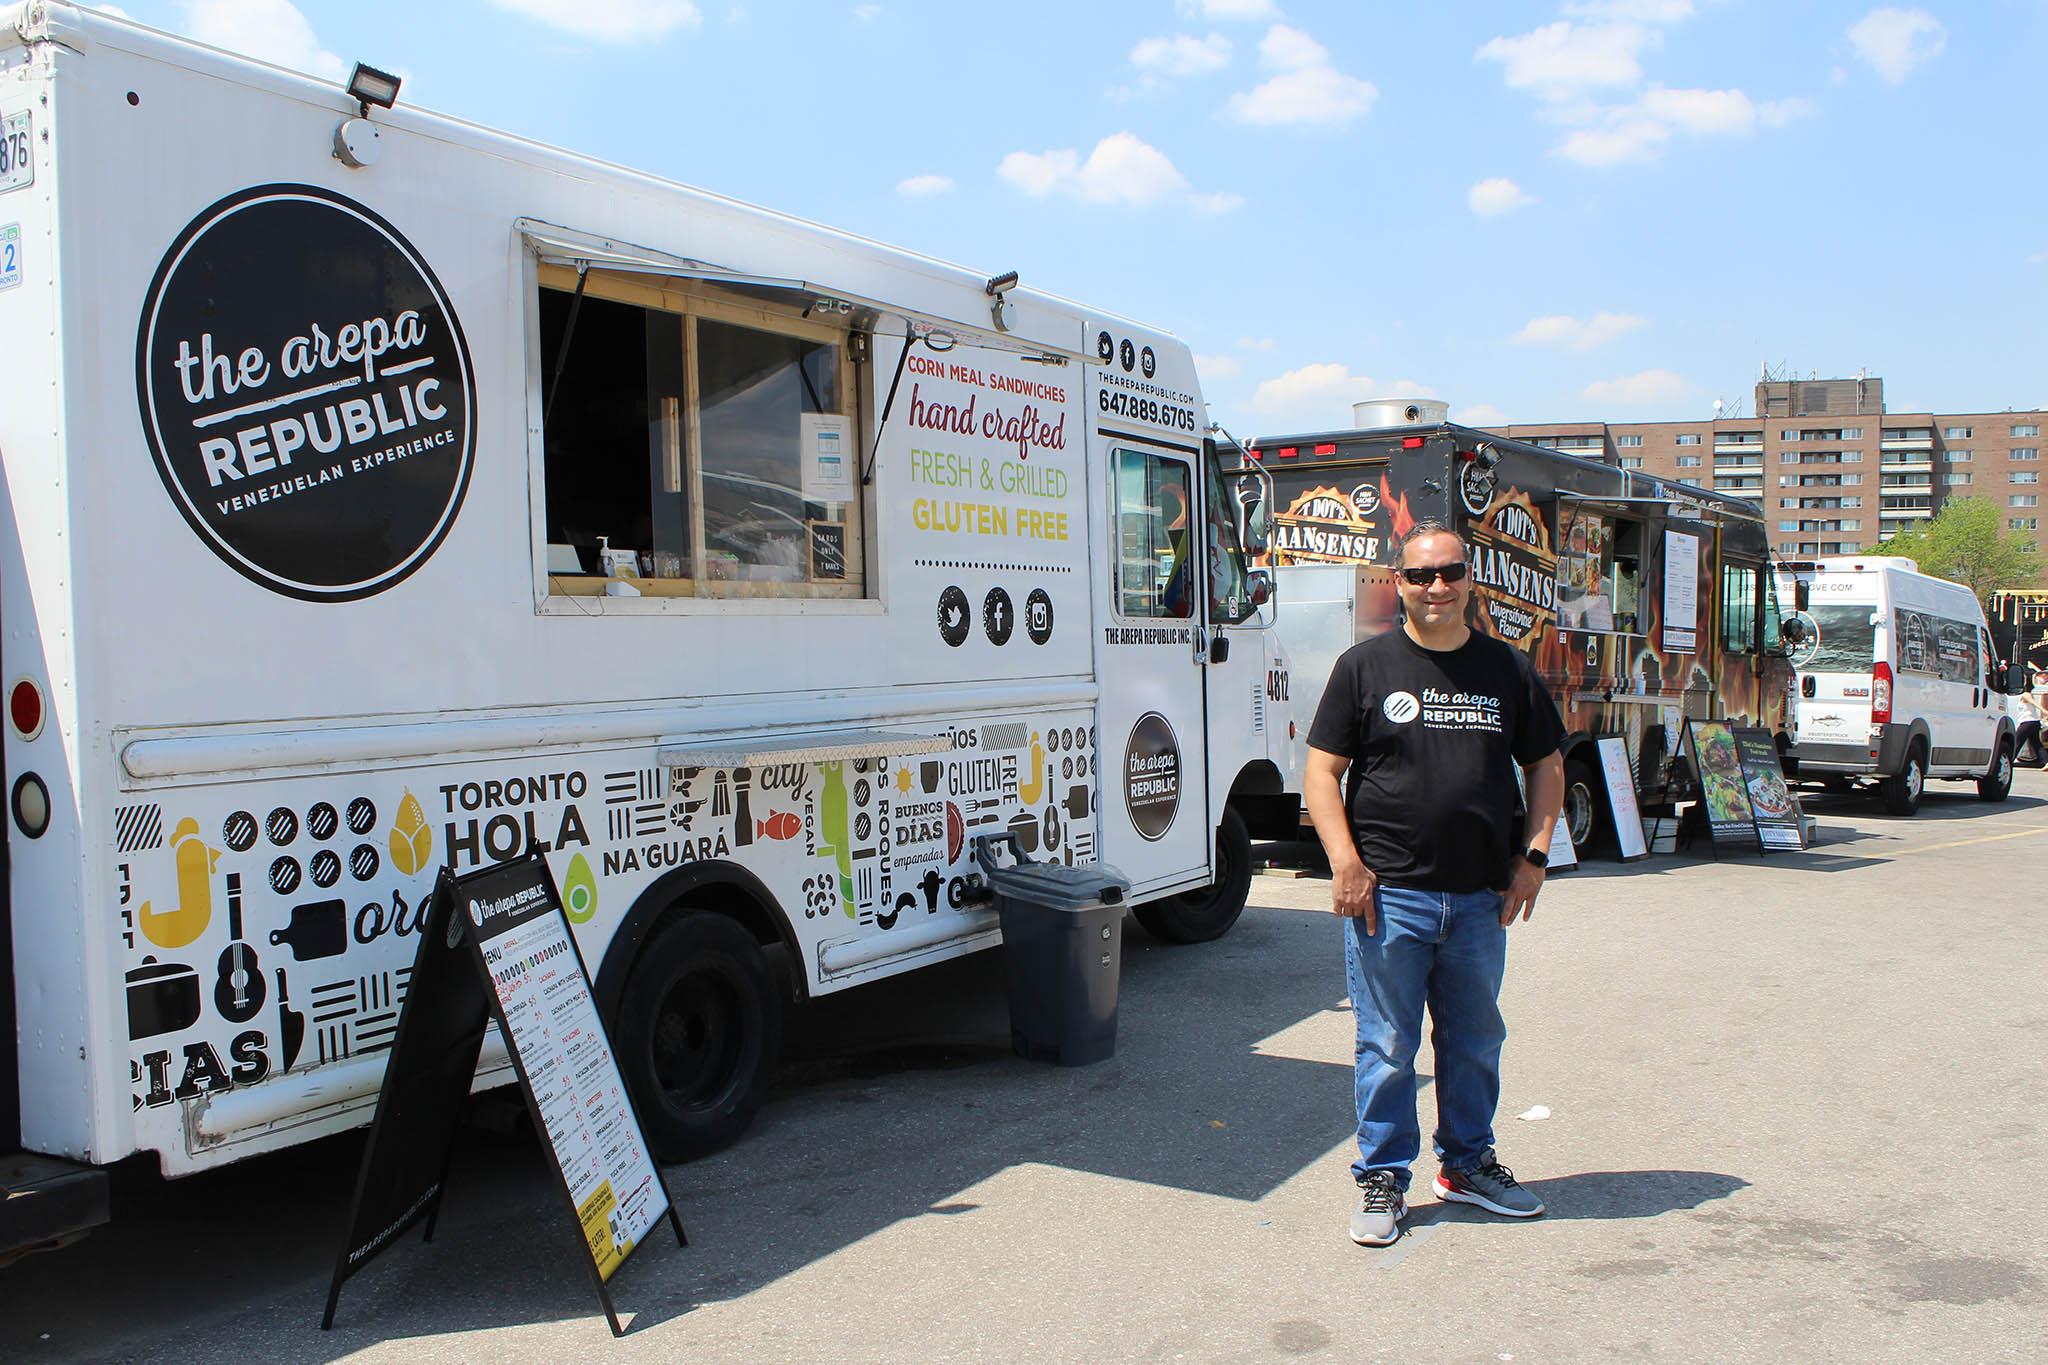 The Arepa Republic Food Truck